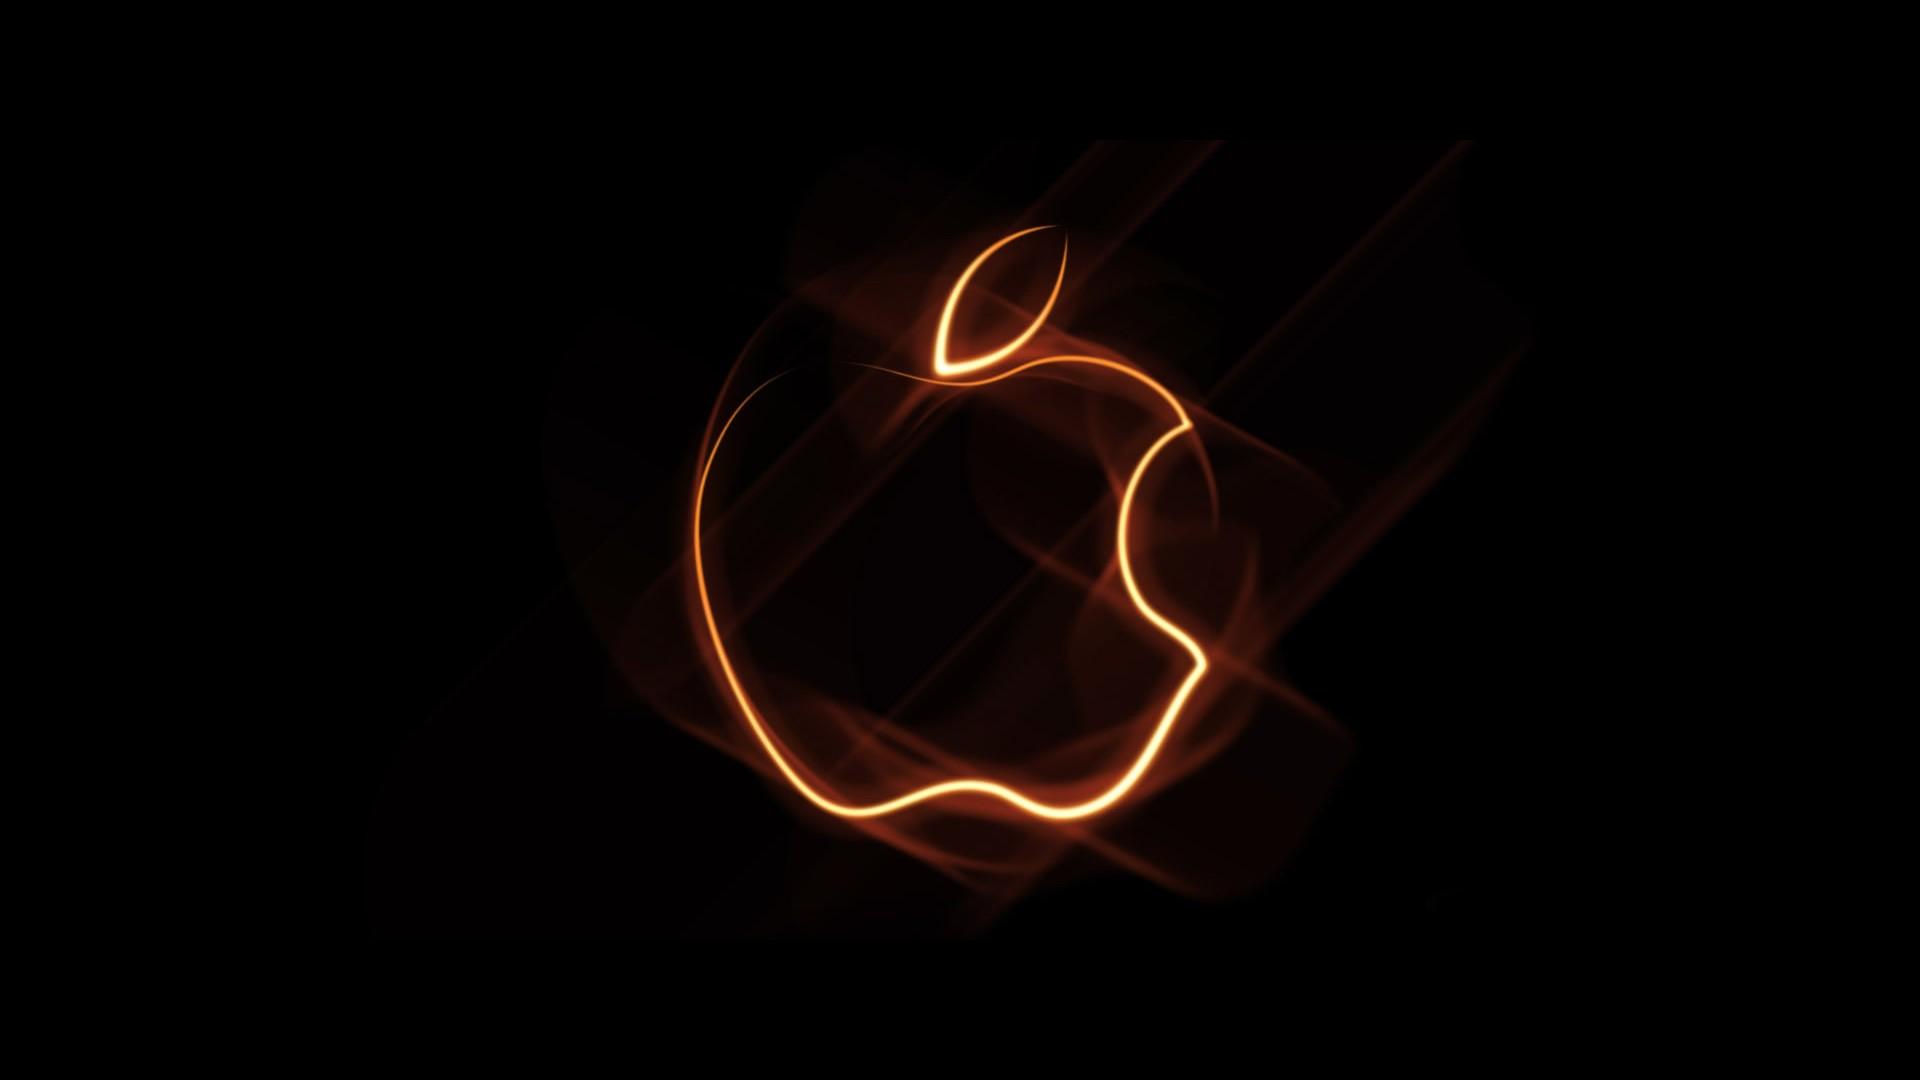 Cool Apple Logo Wallpaper Iphone 8 Plus Wallpaper